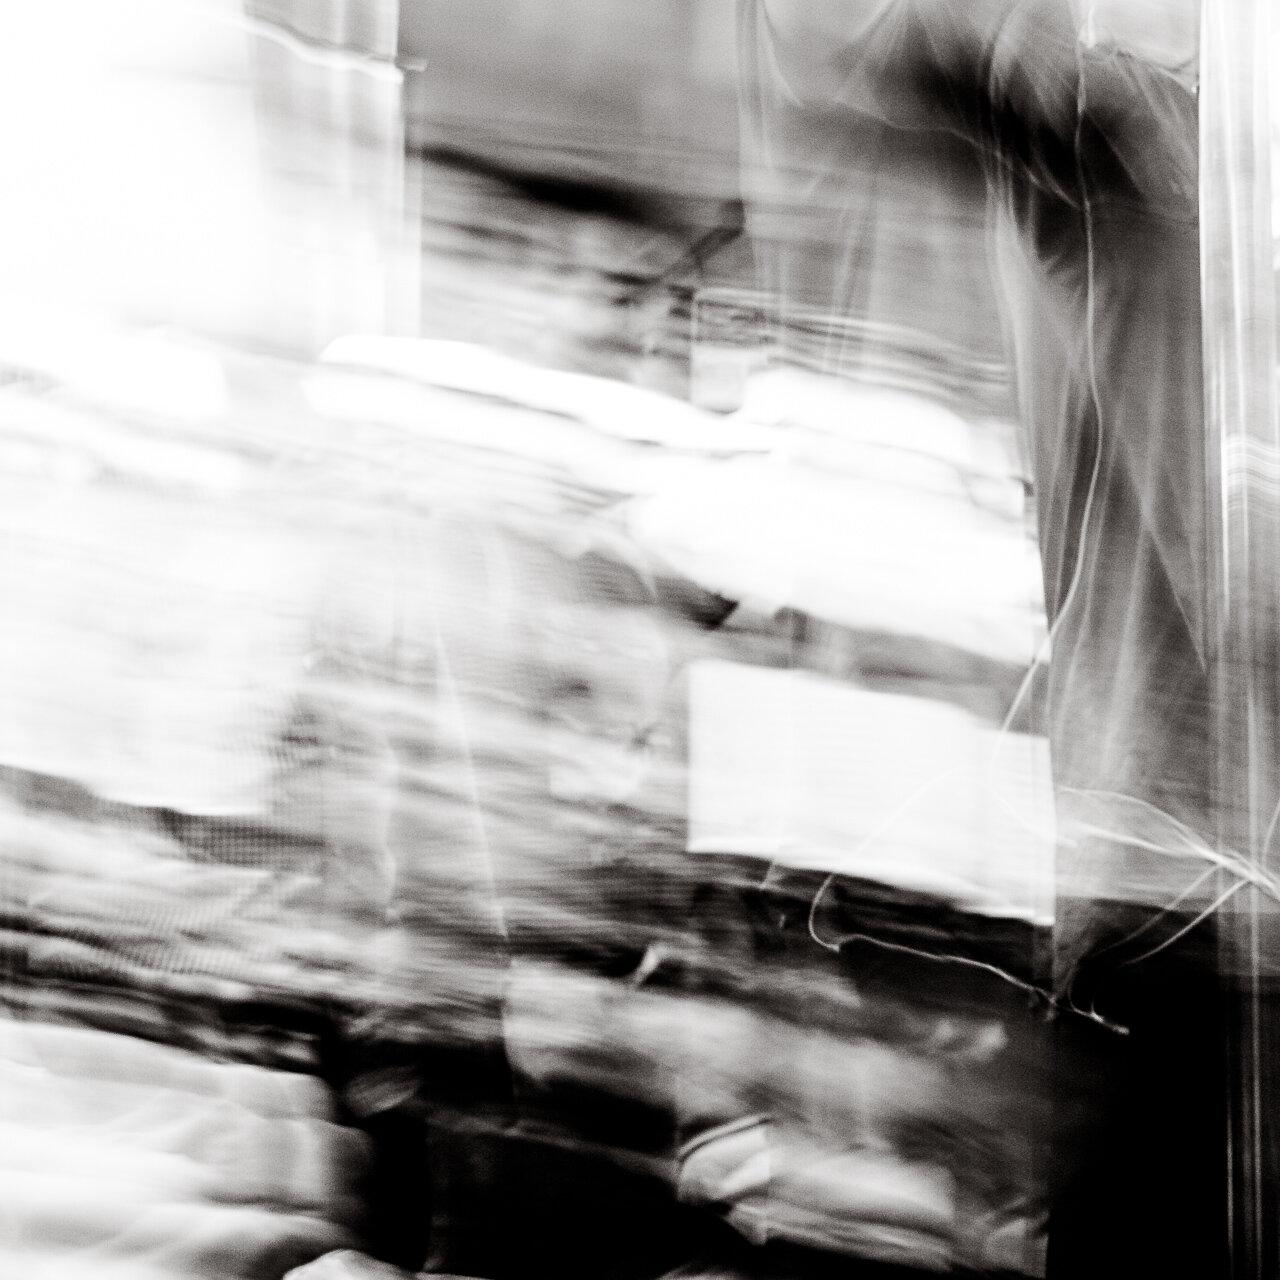 USA, New york, America, Amerika, streetphotography, Straßenfotofotografie, street, Straße, Alltag, everyday life, photo, Foto, photography, Fotografie, people, Menschen - bondarenko-ps_de+00028+_P2M5047.jpg